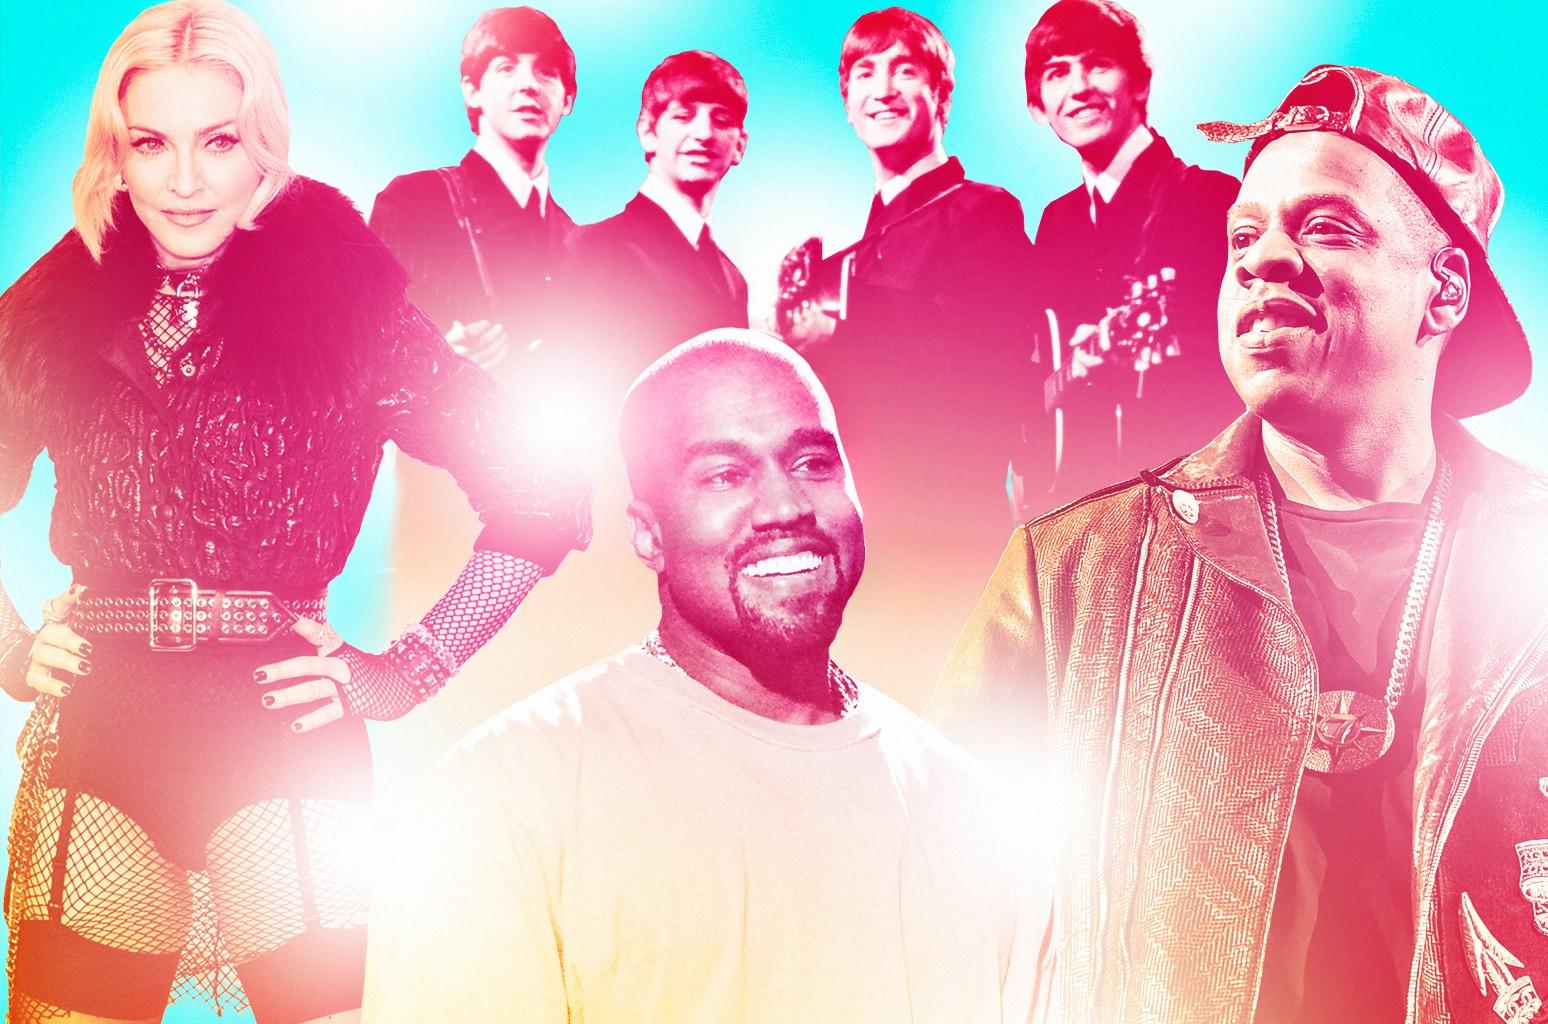 Madonna, The Beatles, Kanye West & Jay-Z